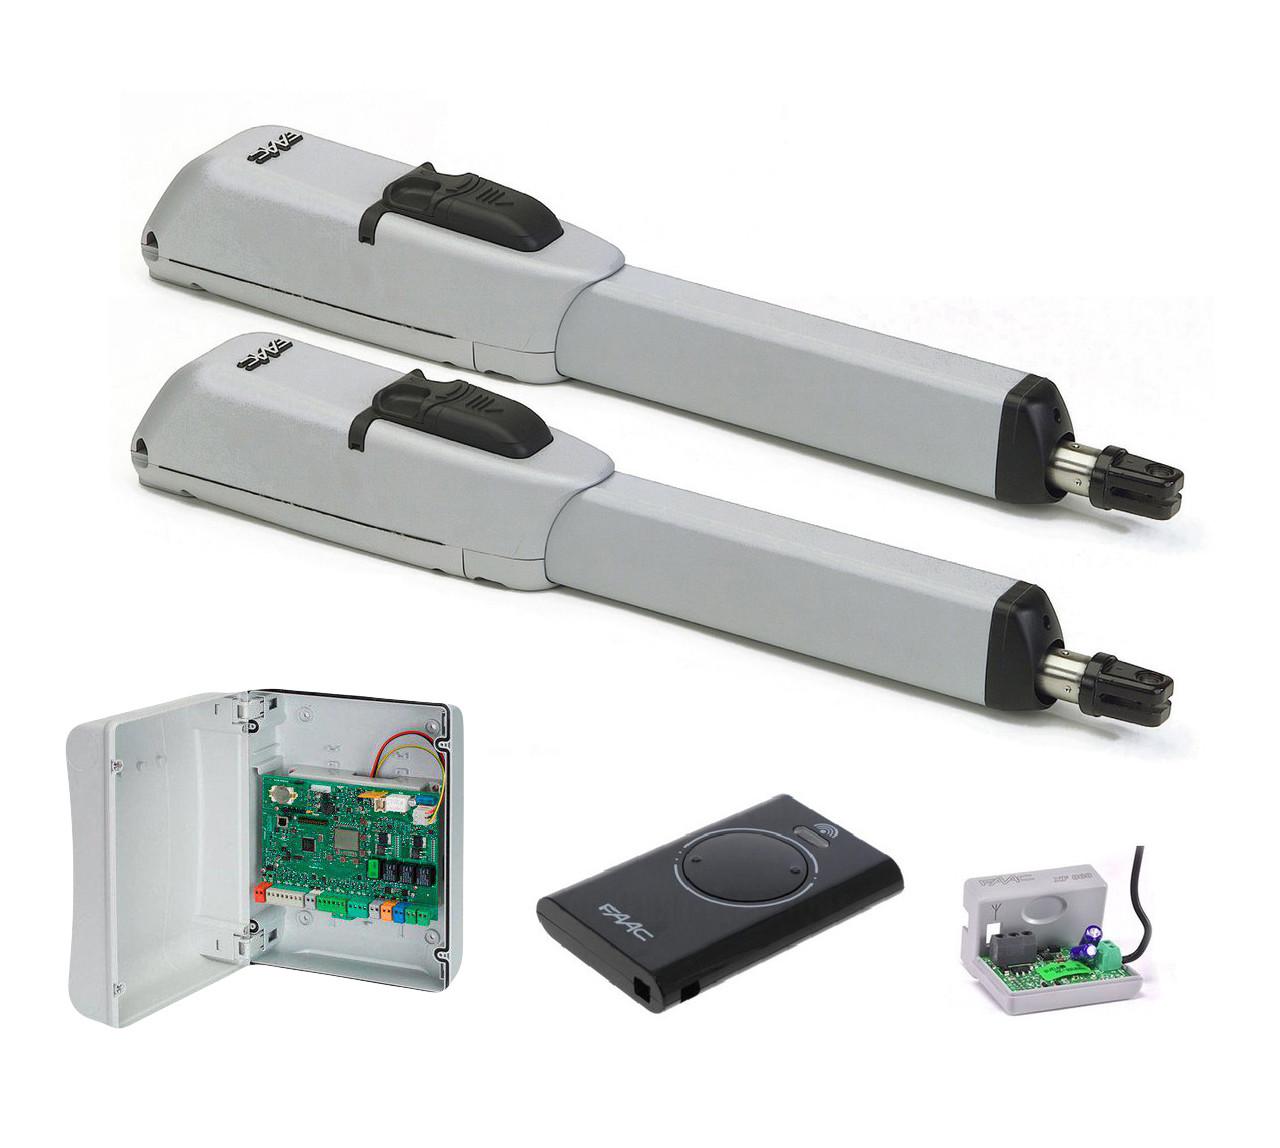 FAAC 415 LS 24В — автоматика для распашных ворот (створка 2,5 до 3 м с электромех. конц.)